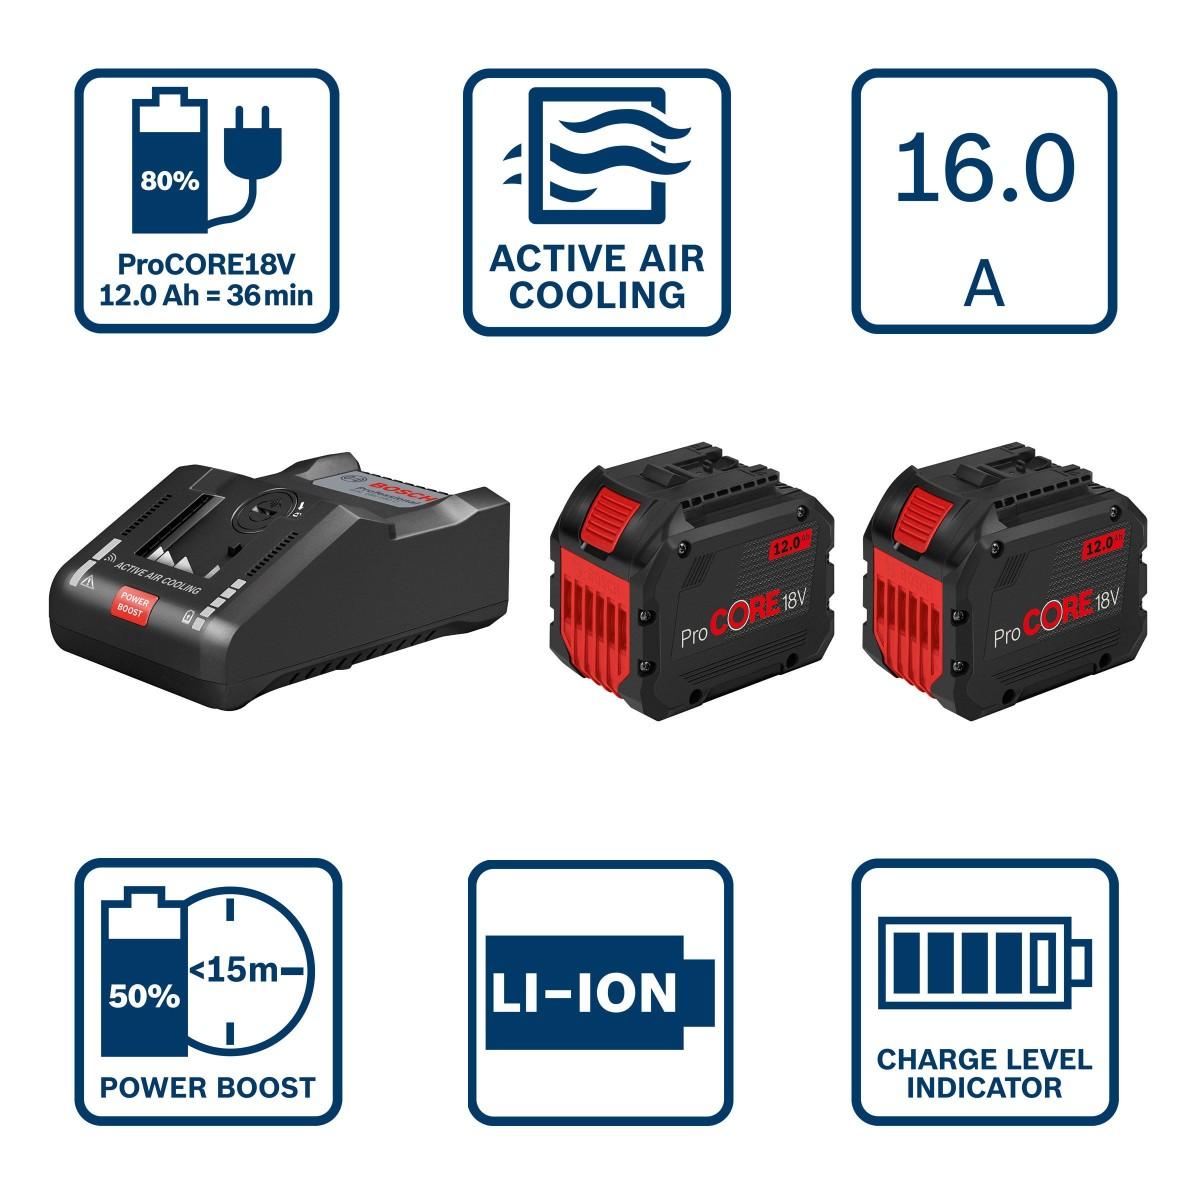 BOSCH Akumulatoru un lādētāja komplekts BOSCH GBA 18V, 2x12Ah ProCORE + GAL 18V-160 C, 1600A016GY